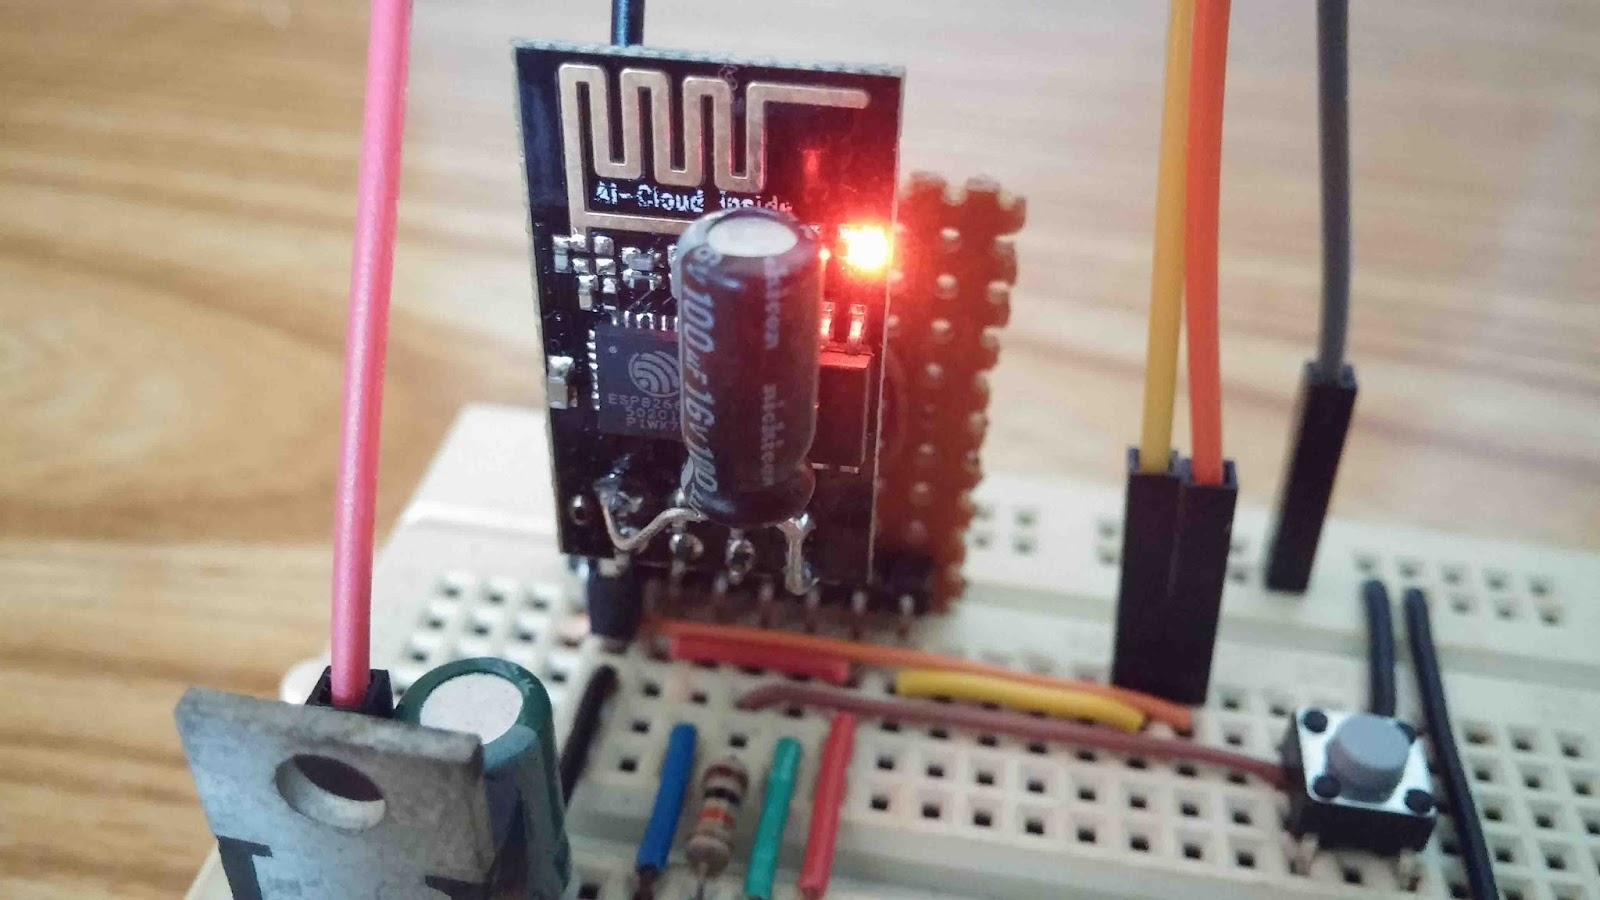 Embedded System Engineering: ESP8266 WiFi Module Tutorial 1